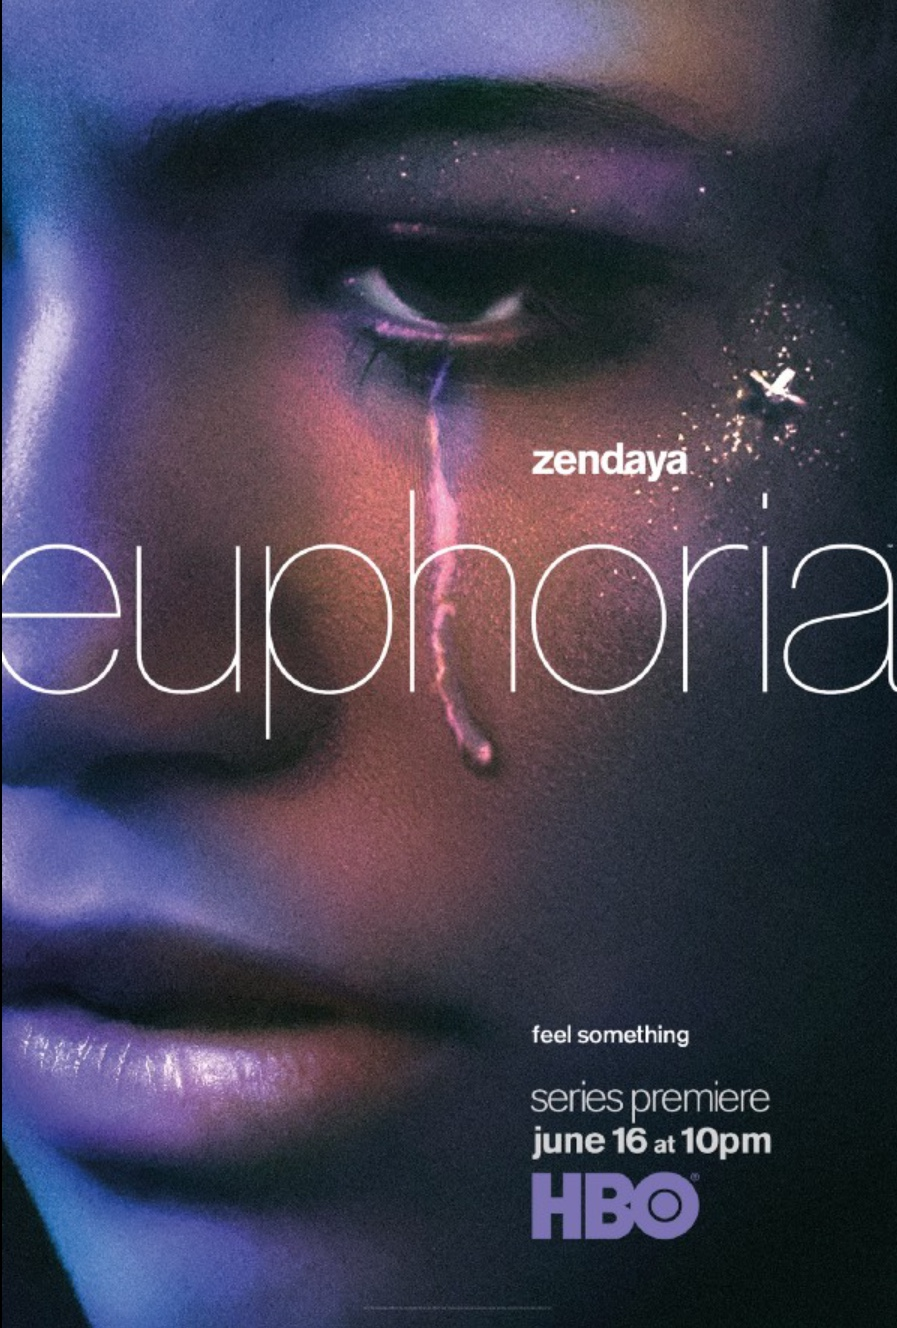 Season 1 of Euphoria stars Zendaya, Maude Apatow and Angus Cloud. It premiered on Aug 4, 2019 on HBO.